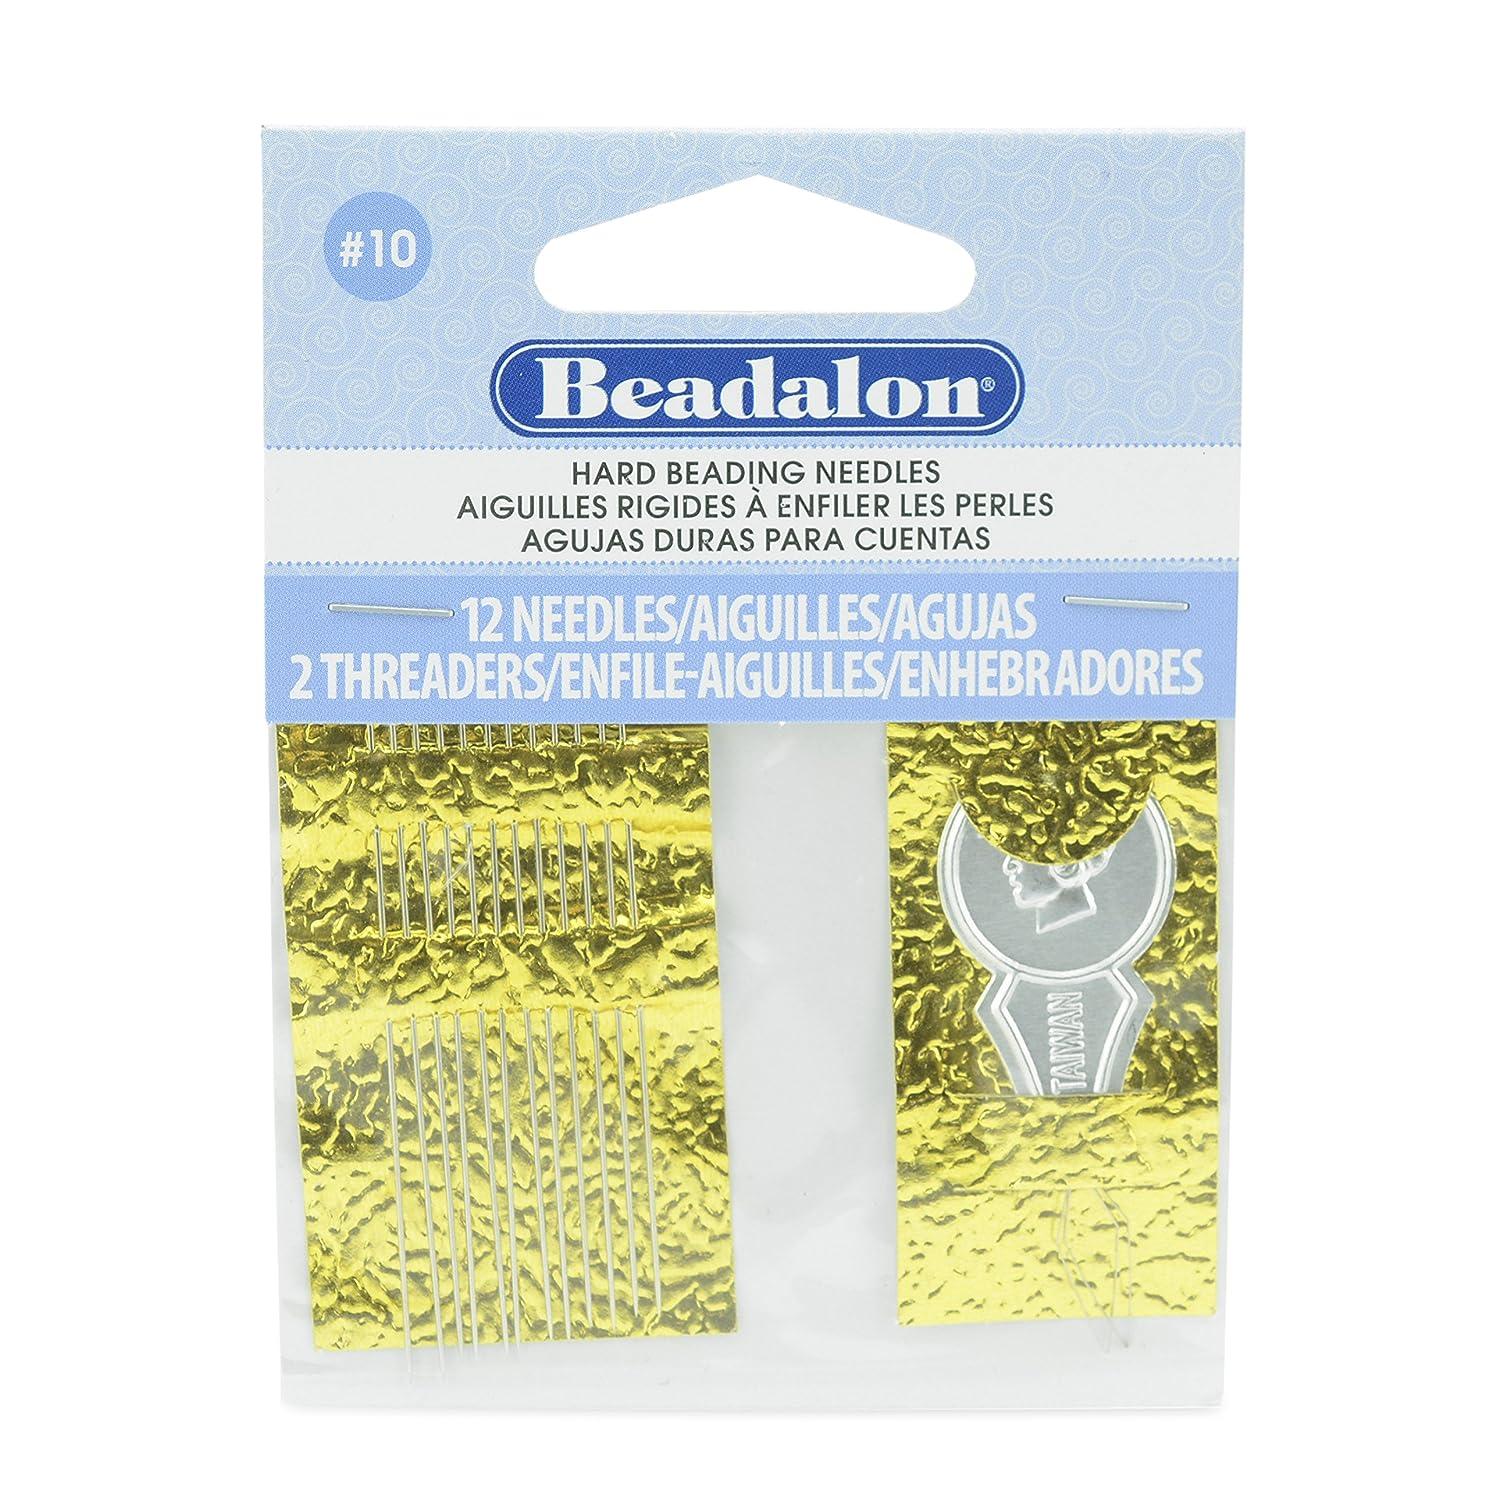 Beadalon JNEEH10/12 BEADLON Needles Size 10 12 Pack, Multicolor